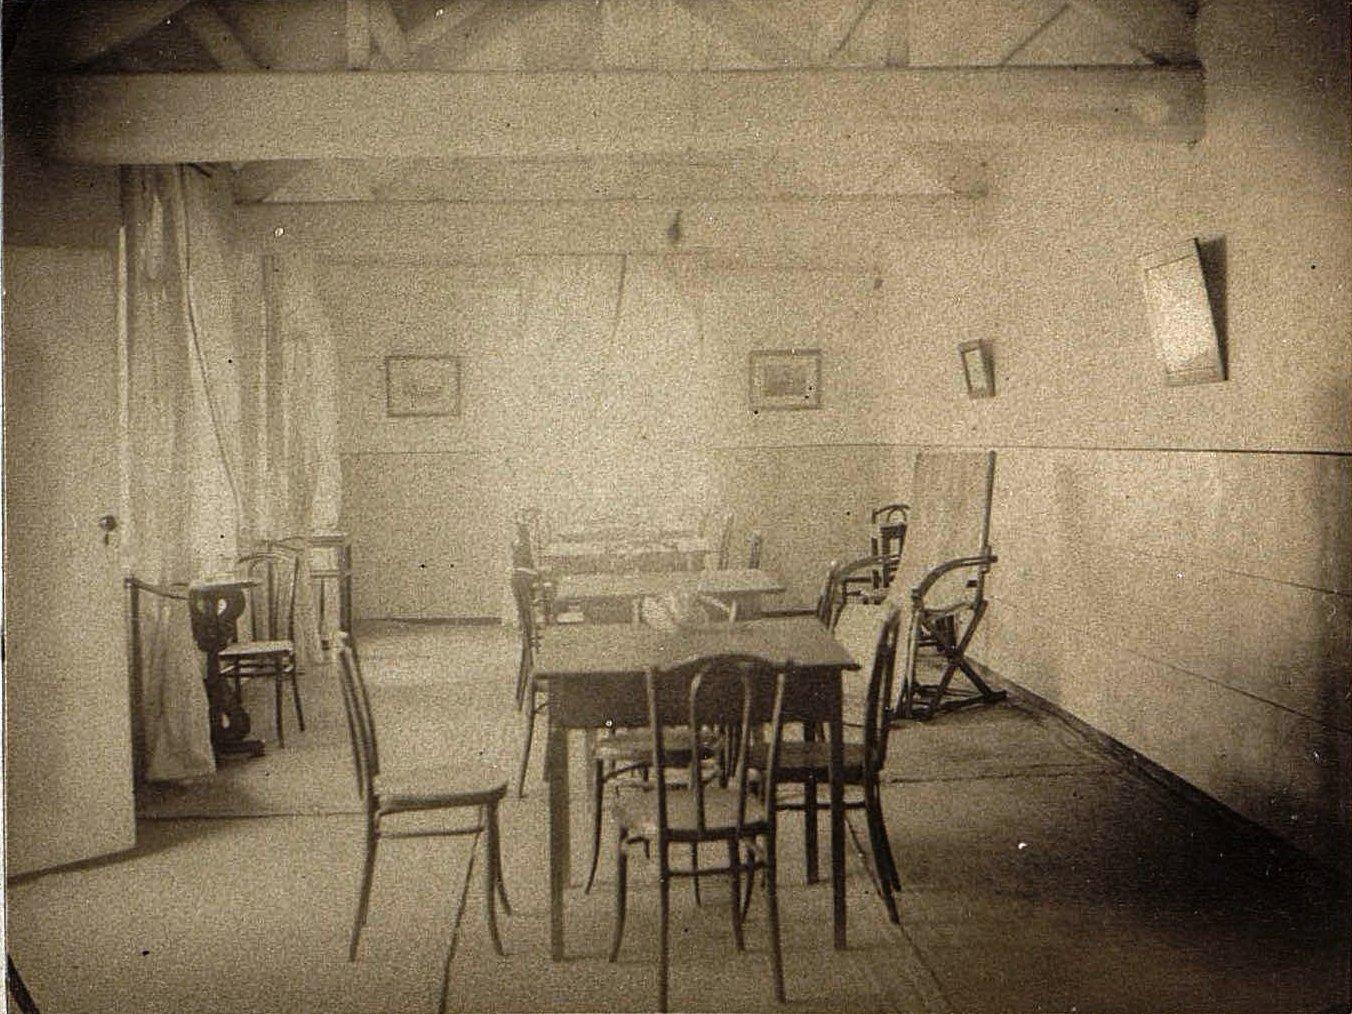 1898. Китай, г. Талиенван. Внутренний вид Талиенванского морского собрания. Июль.